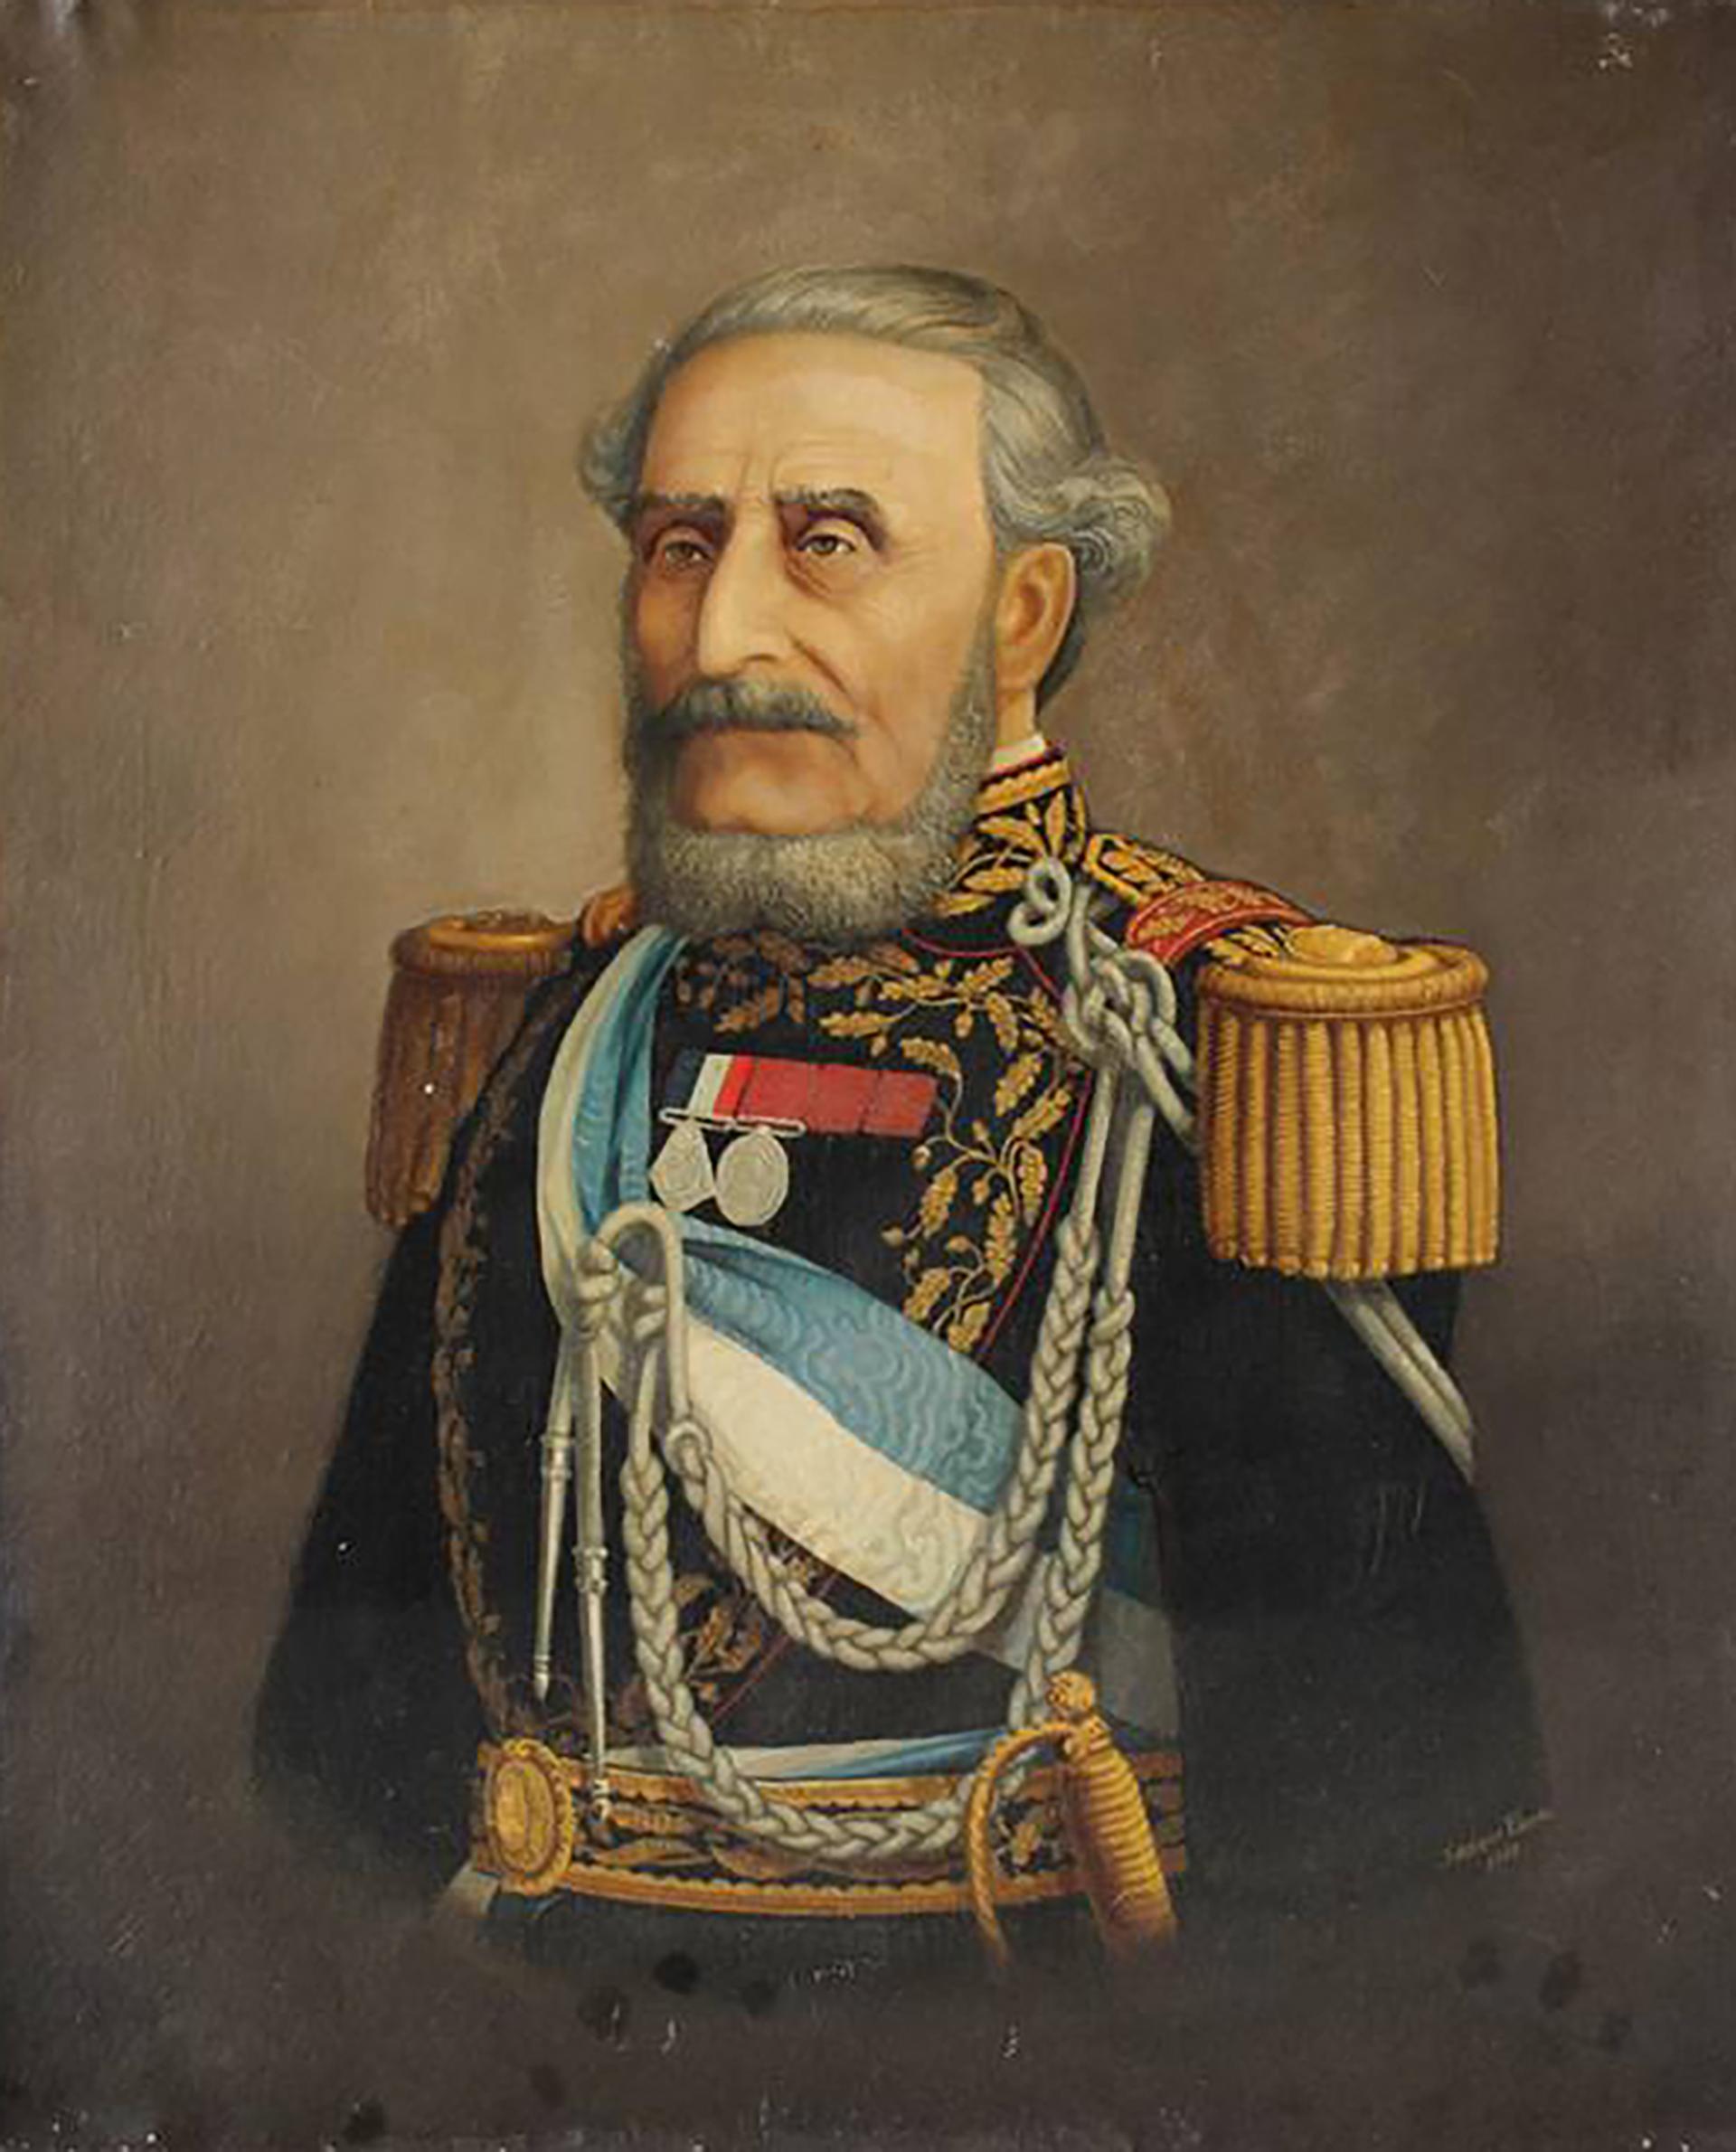 Juan Esteban Pedernera